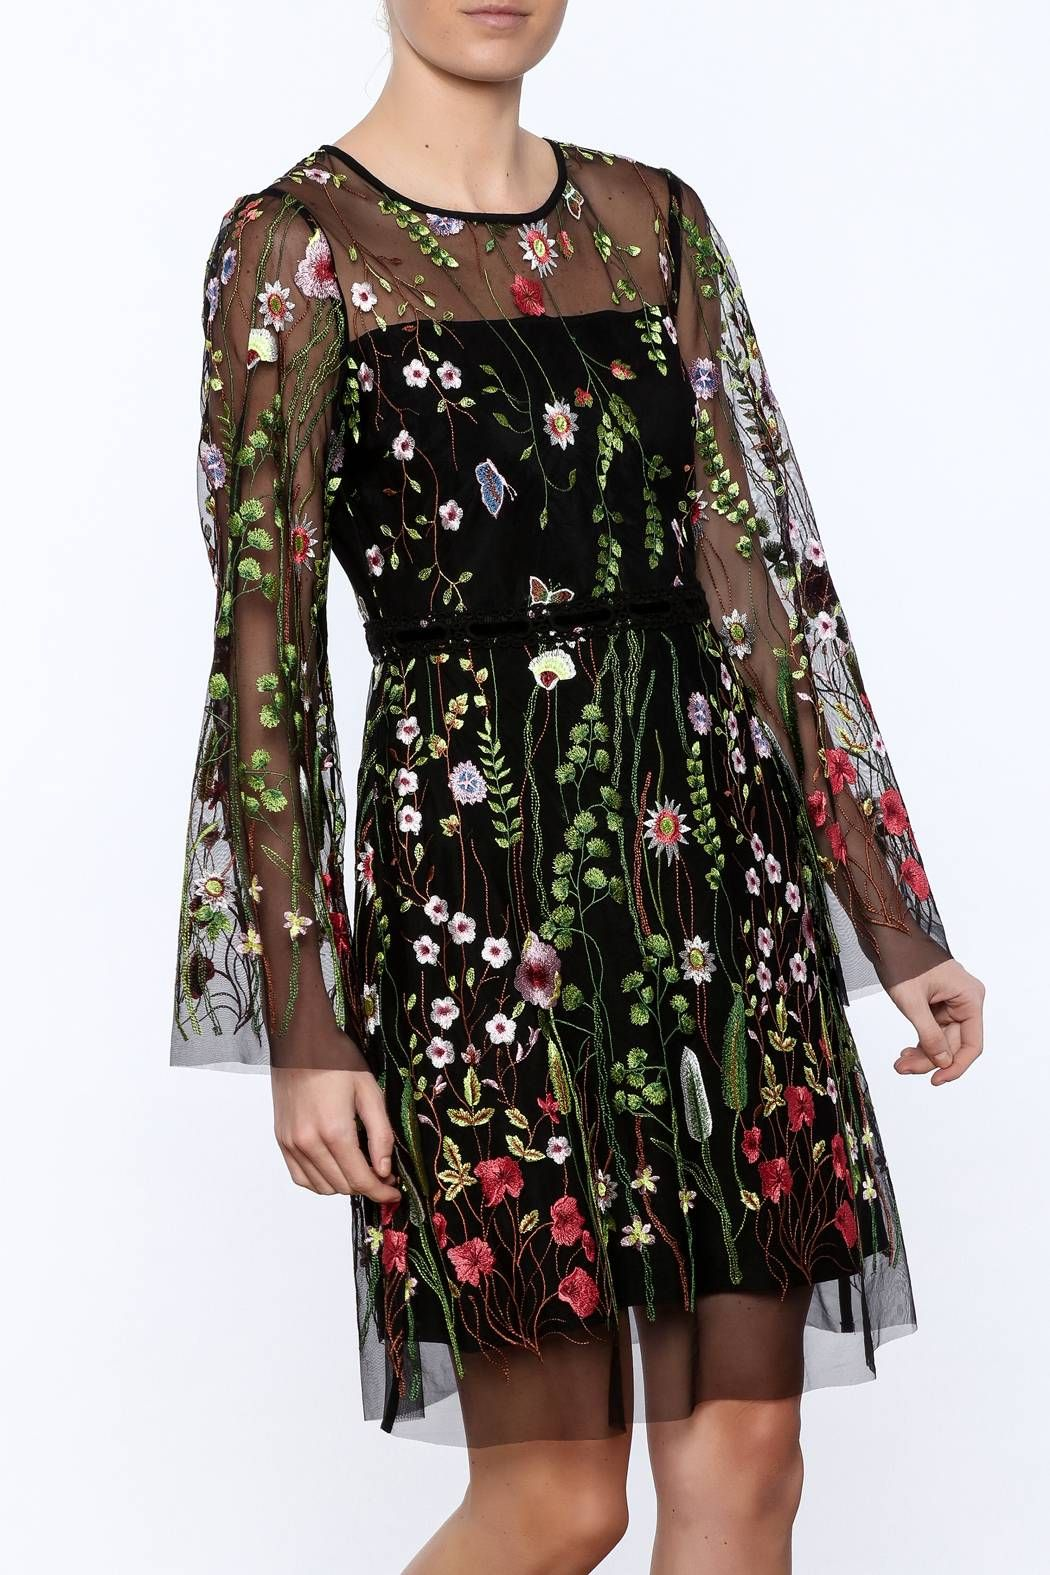 Sheer Sleeved Embroidered Floral Dress Floral Embroidered Dress Dresses Fashion [ 1575 x 1050 Pixel ]